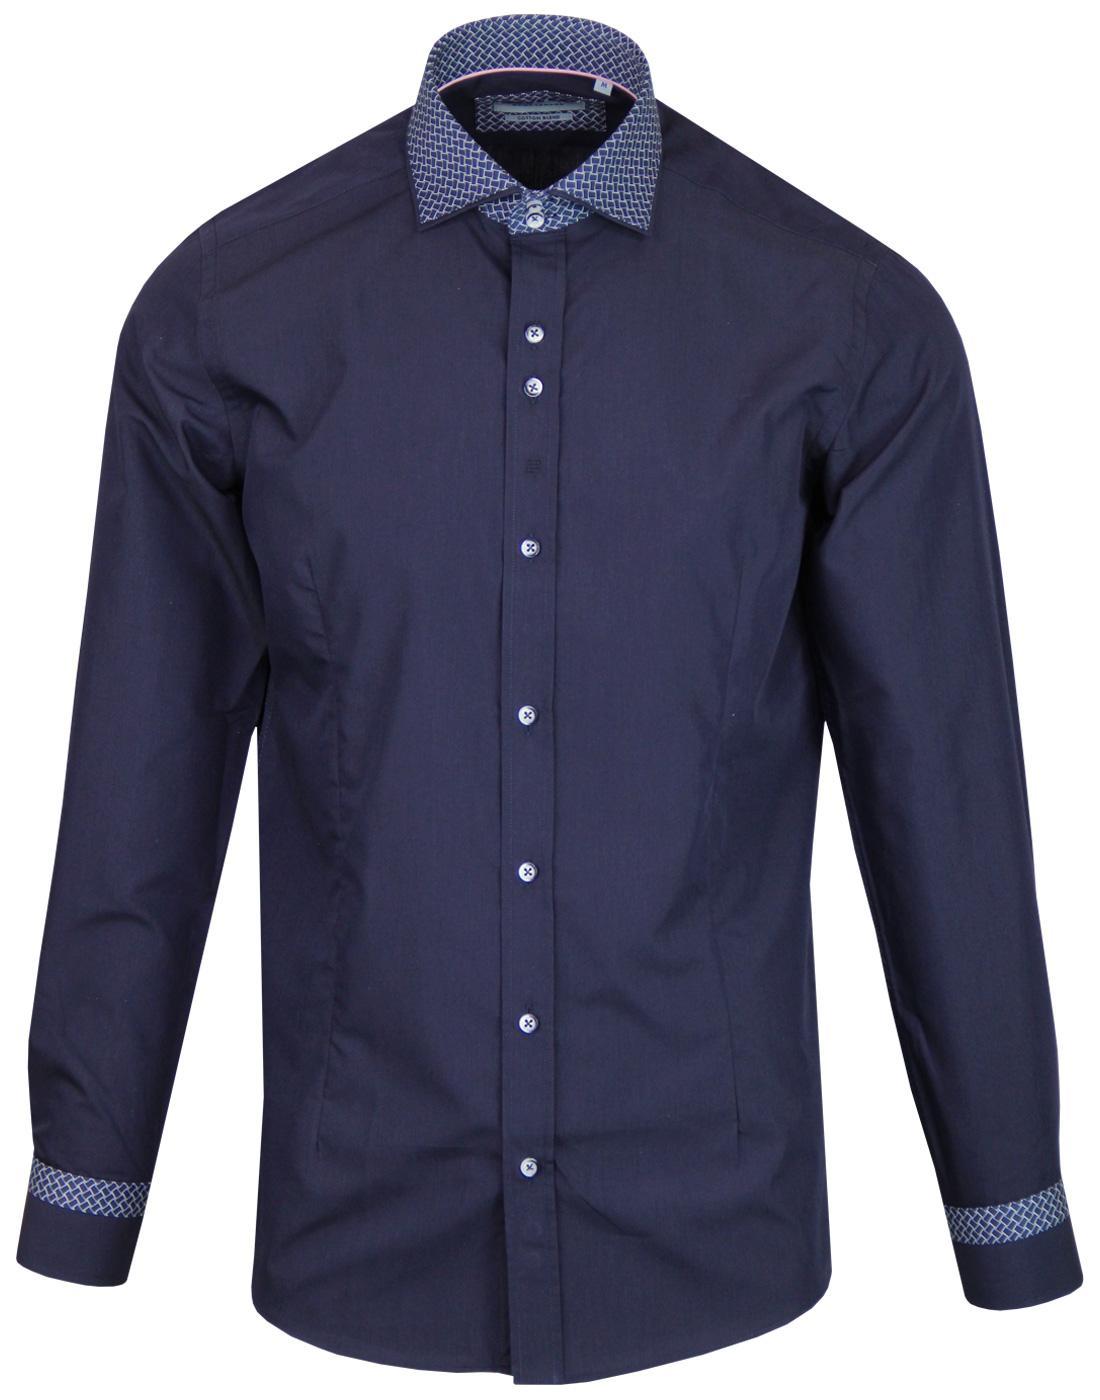 GUIDE LONDON Retro Mod Weave Collar Print Shirt N